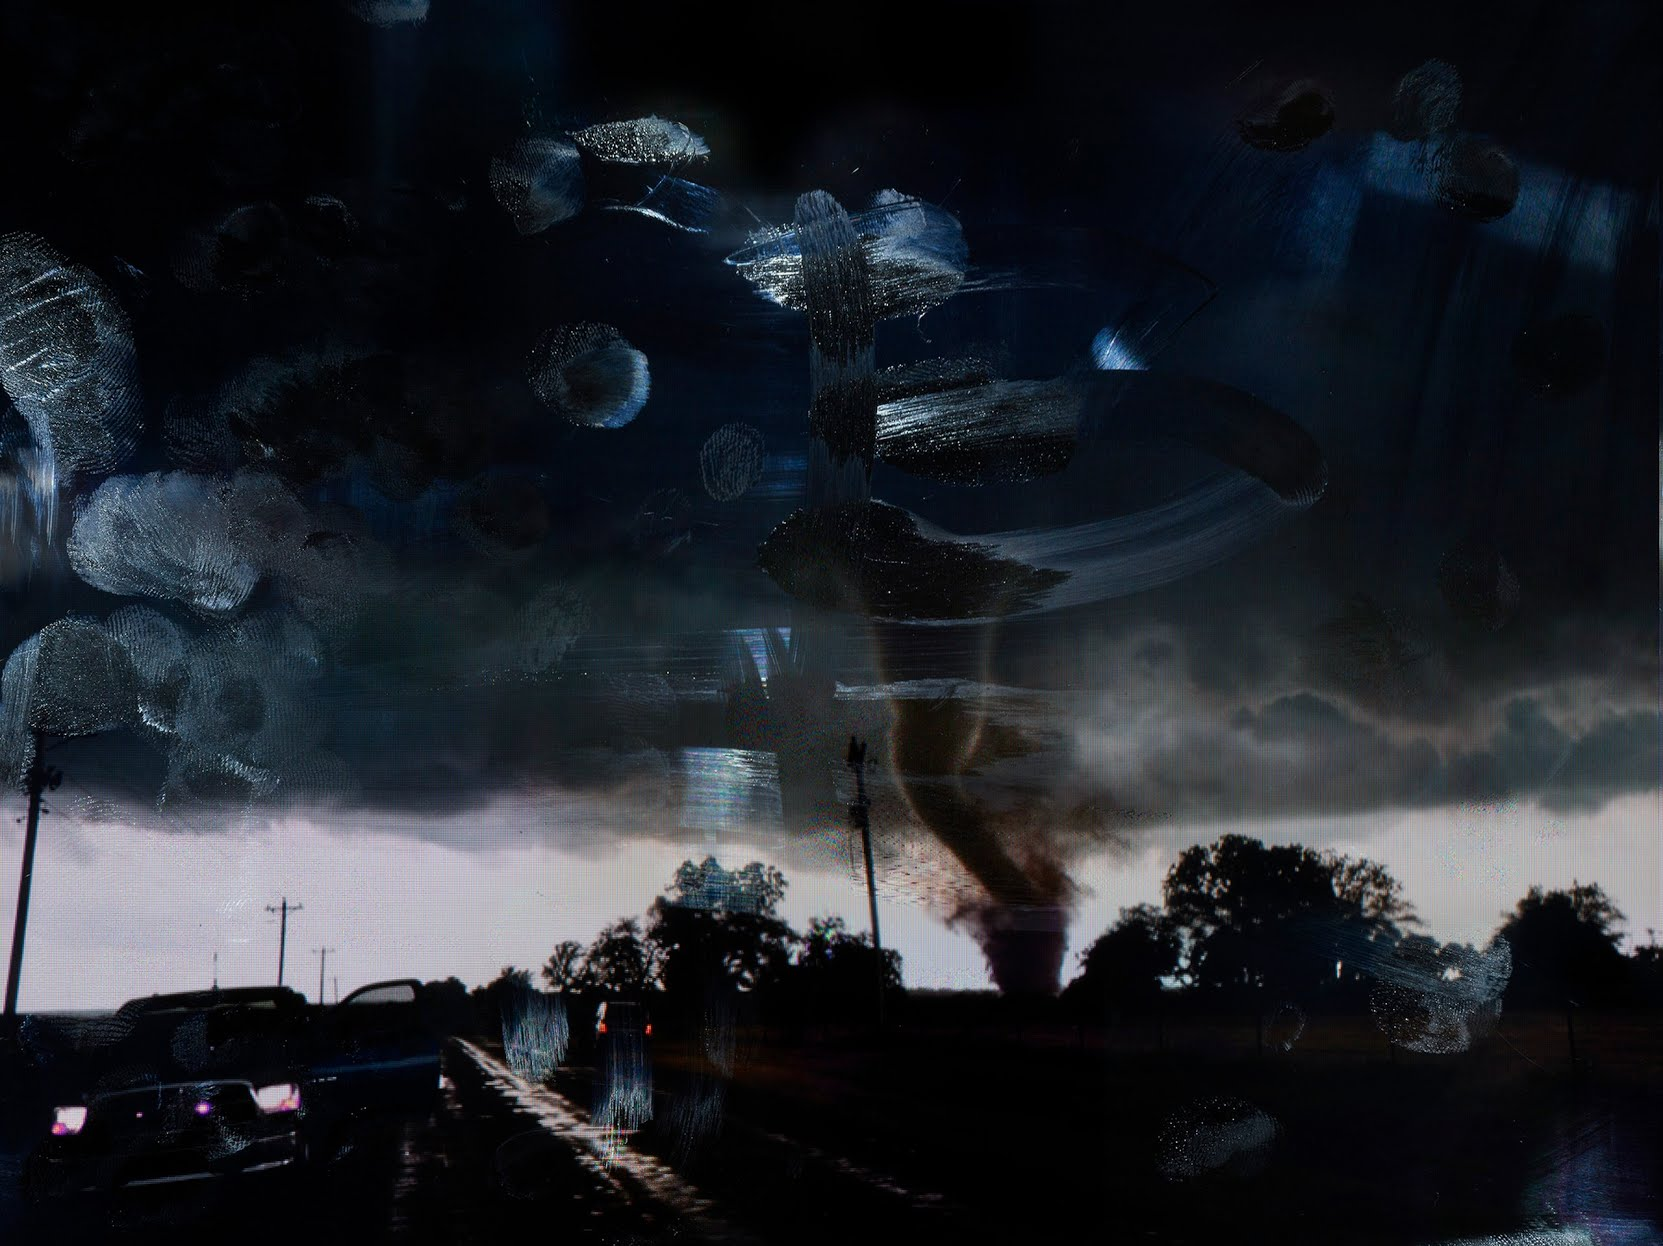 A tornado in an ominously dark sky.